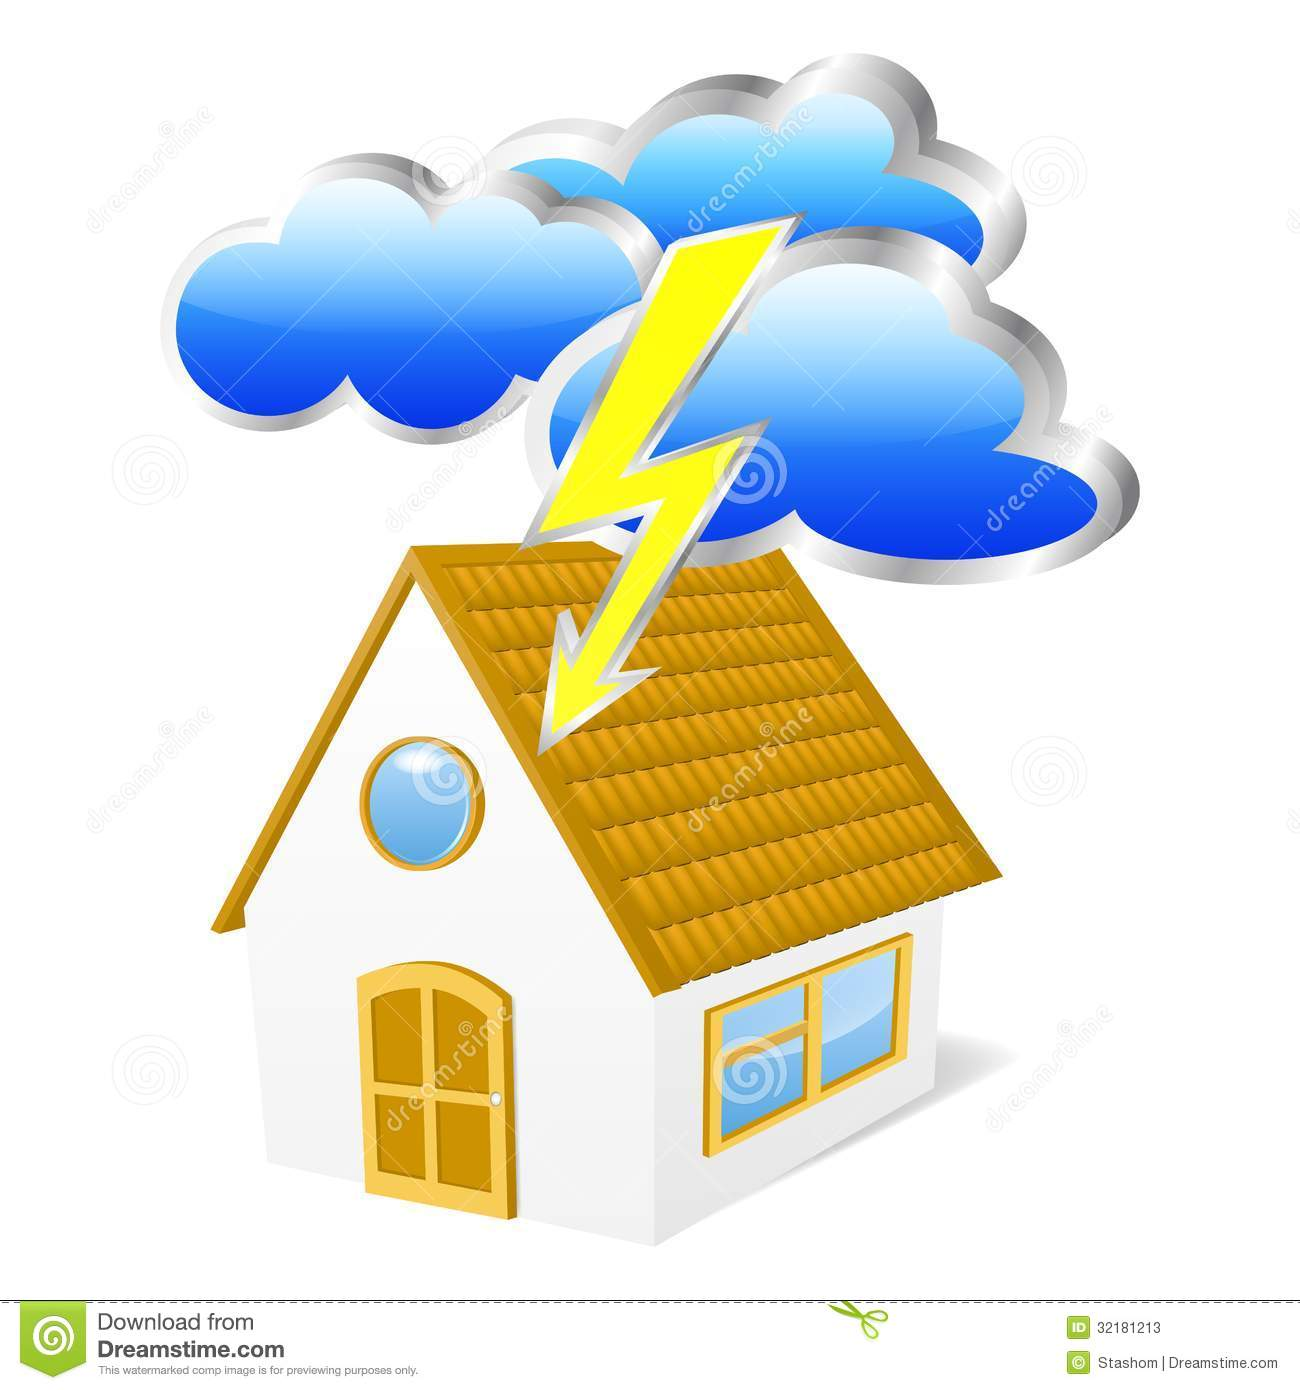 House in Clouds Clip Art.